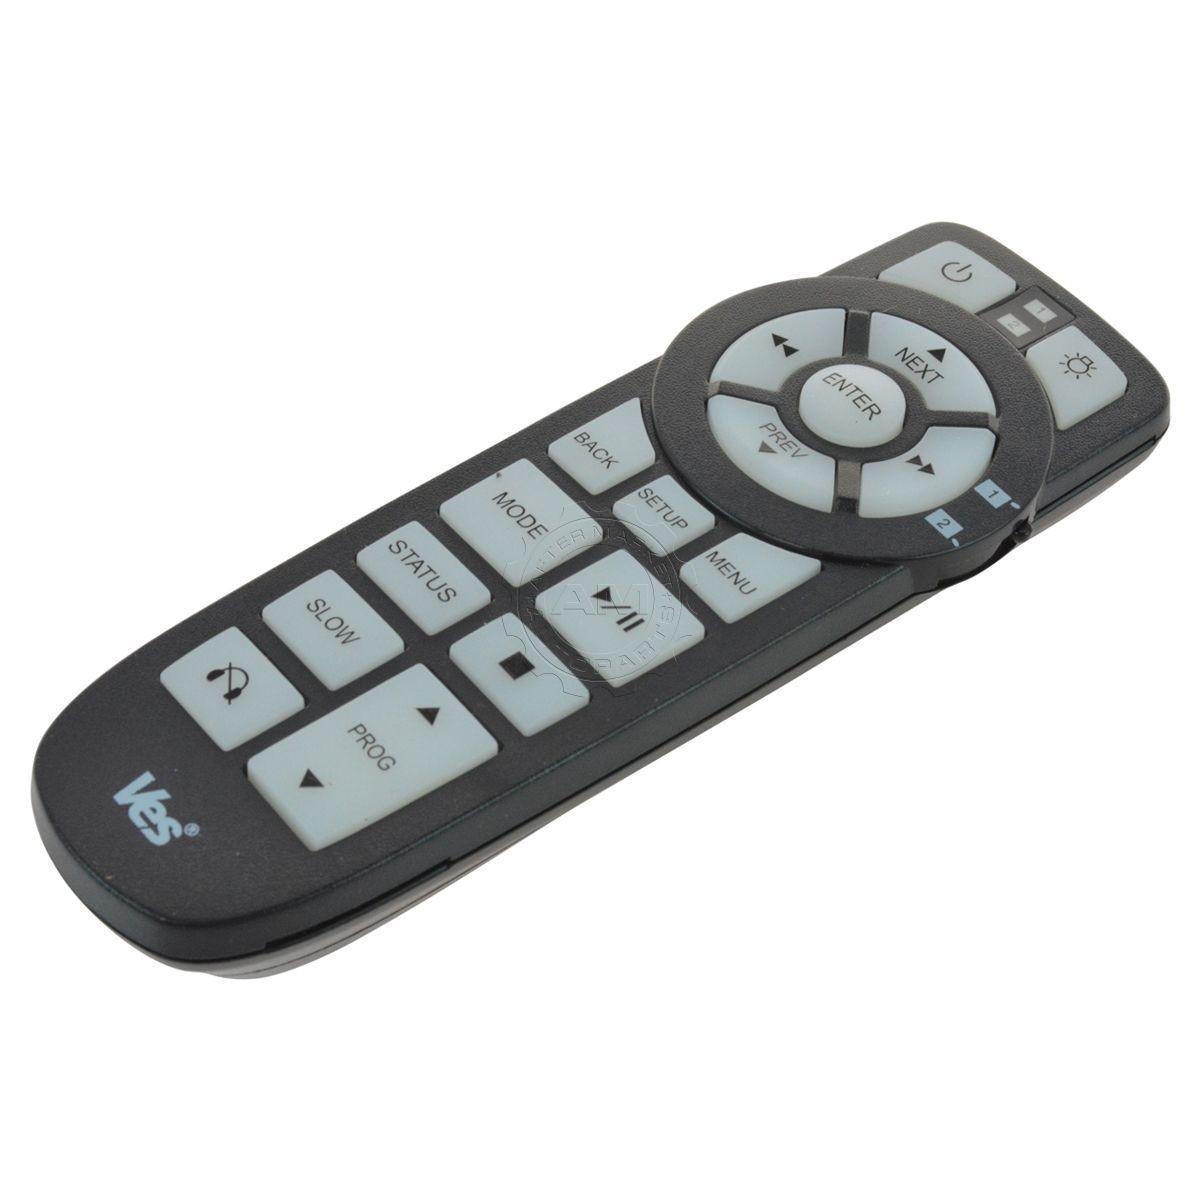 2008-2018 Dodge Grand Caravan VES DVD Remote Control